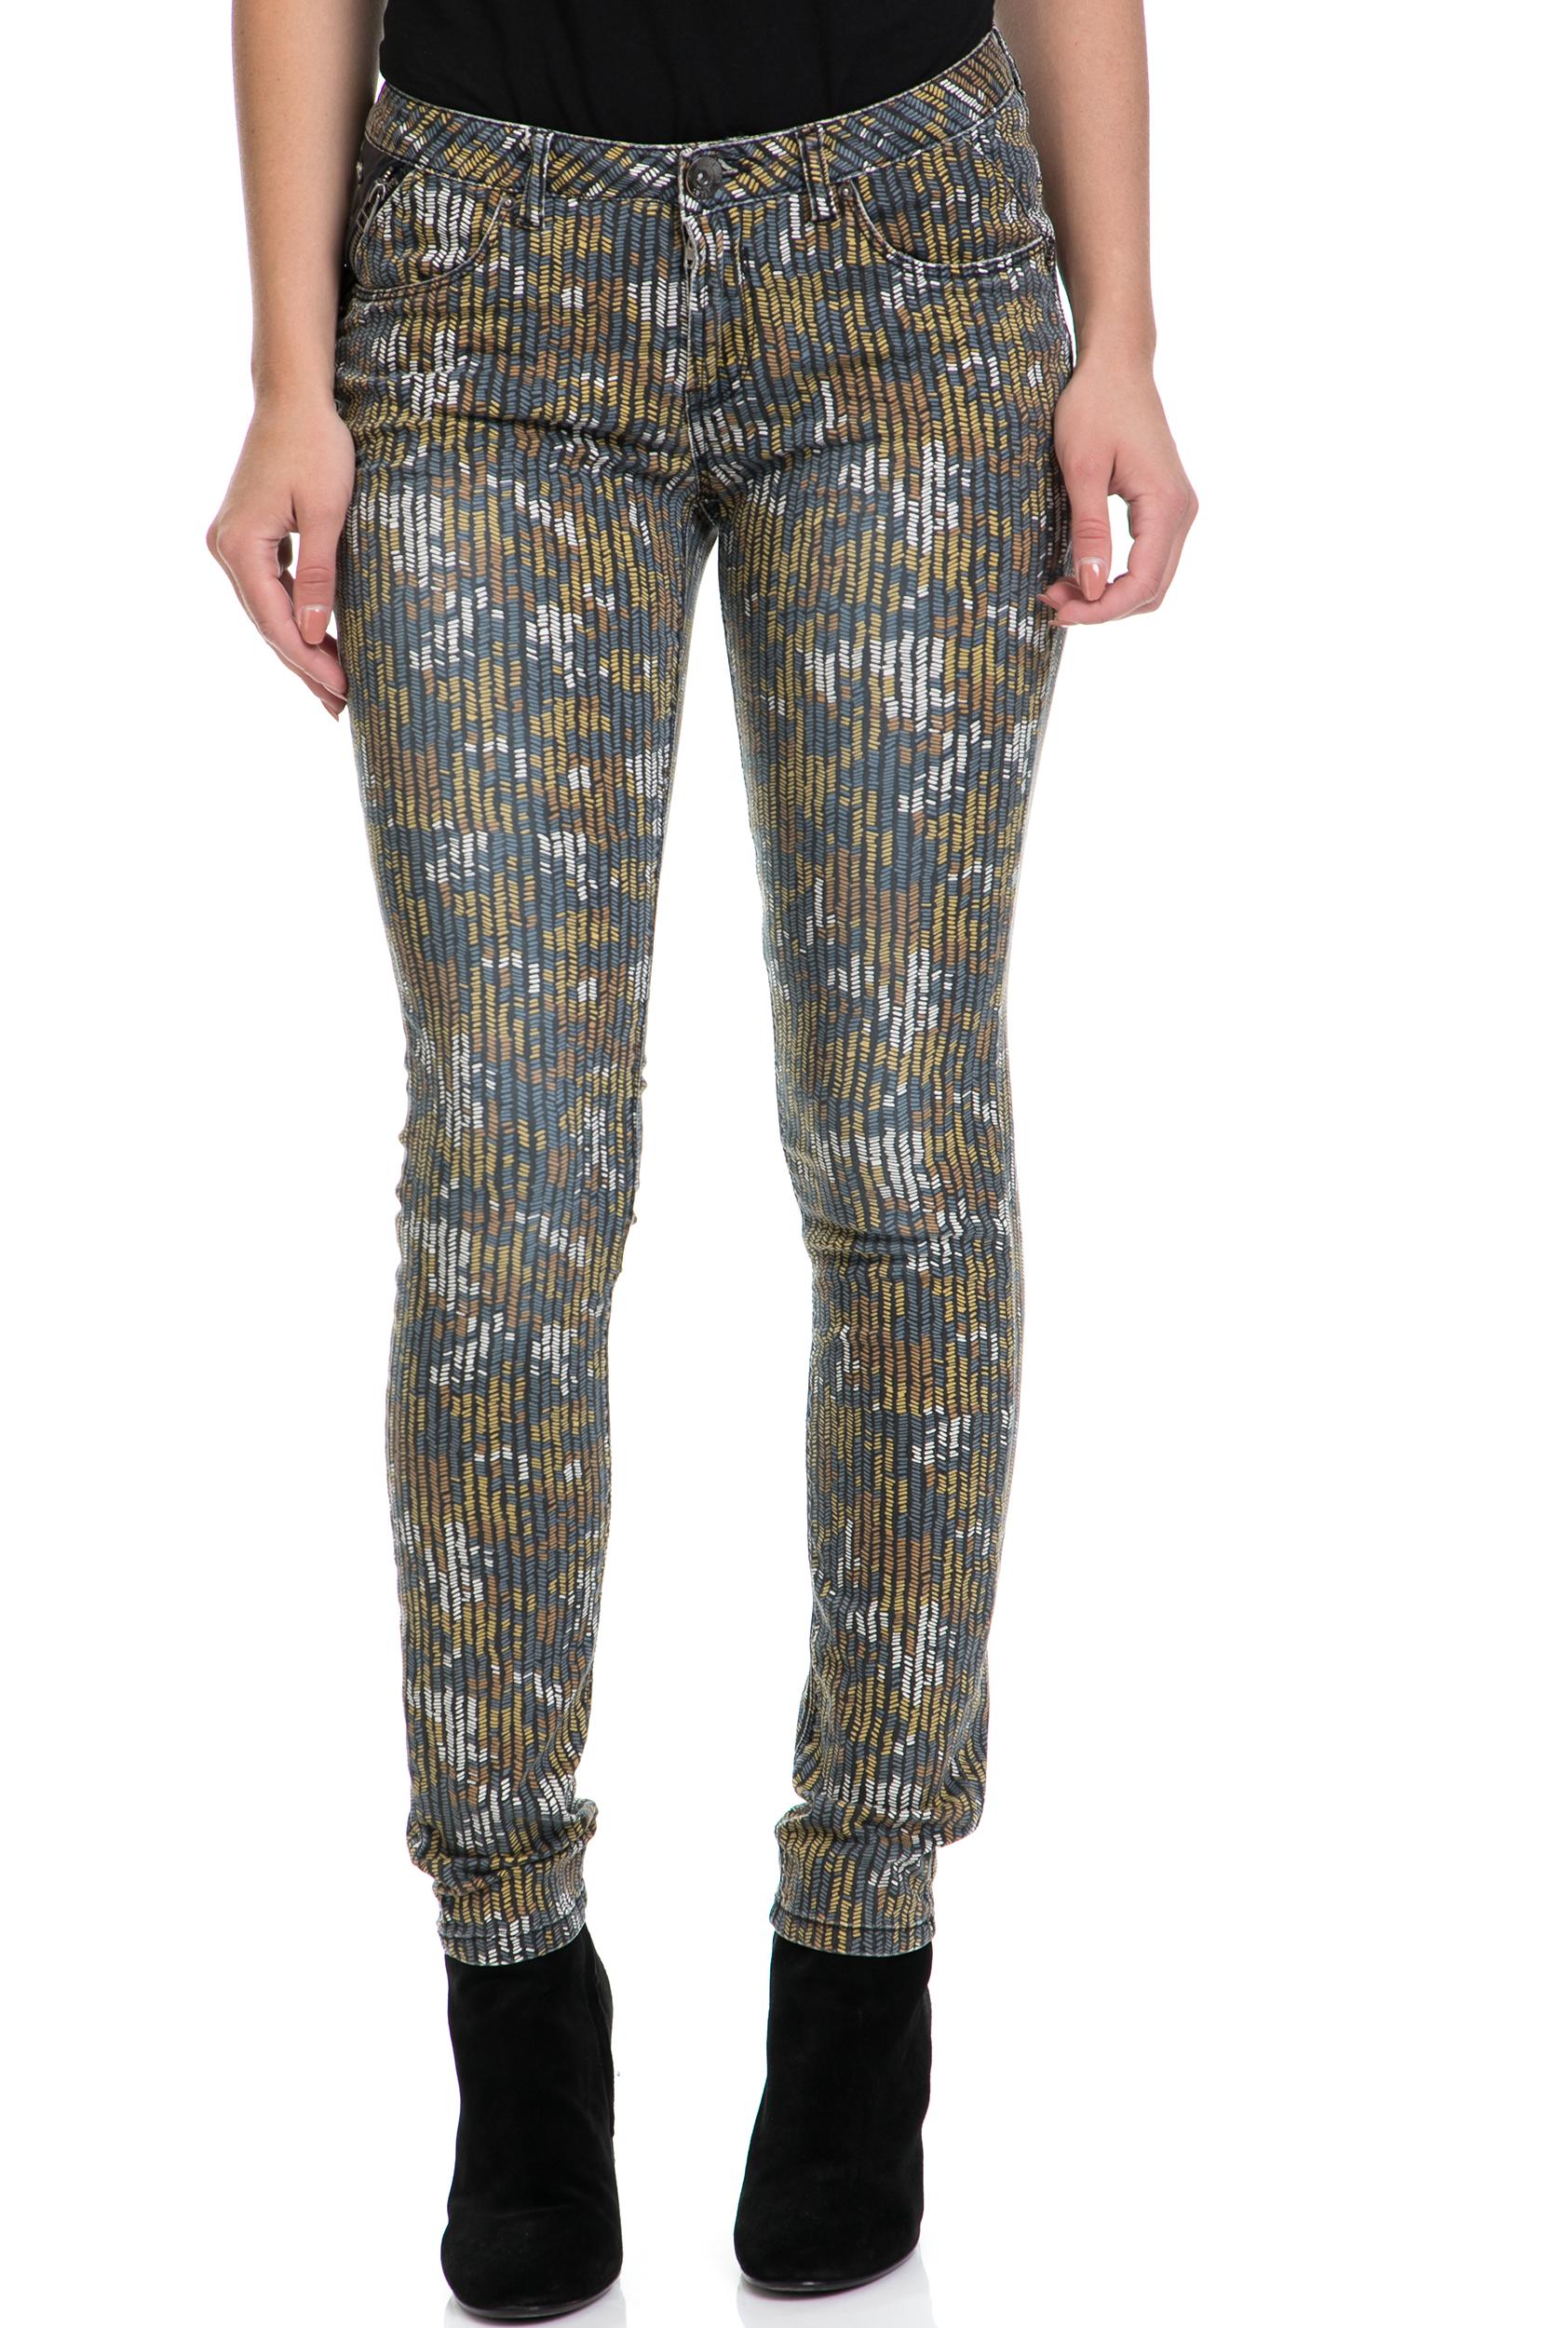 GARCIA JEANS - Γυναικείο παντελόνι Riva μπλε-χρυσό γυναικεία ρούχα παντελόνια skinny